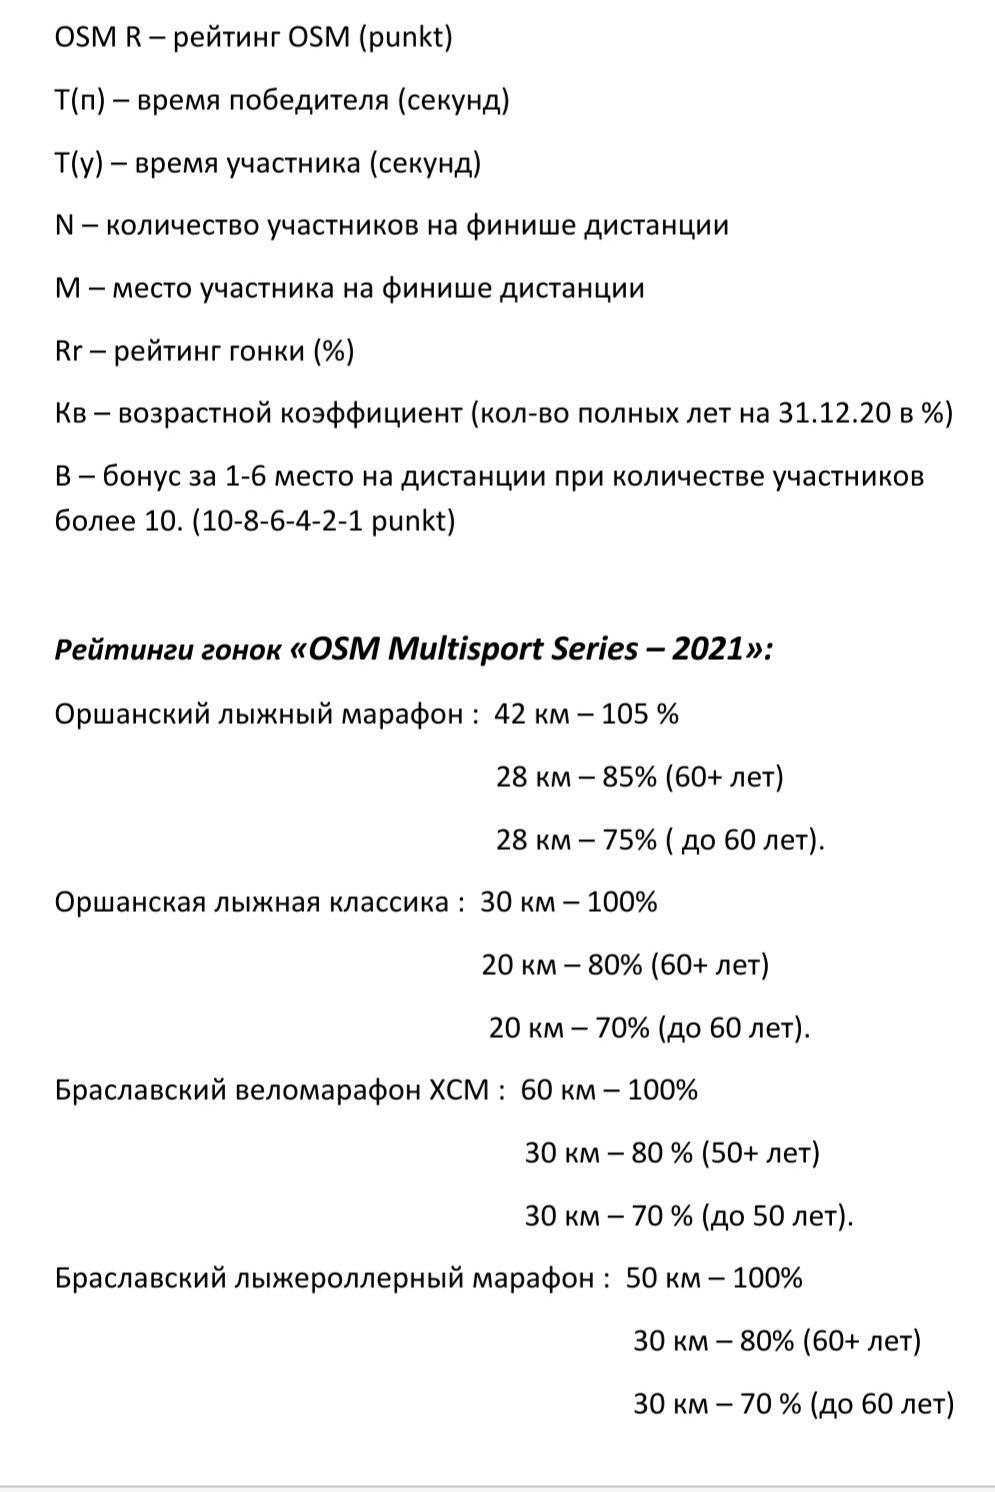 IMG_20201202_000317.jpg